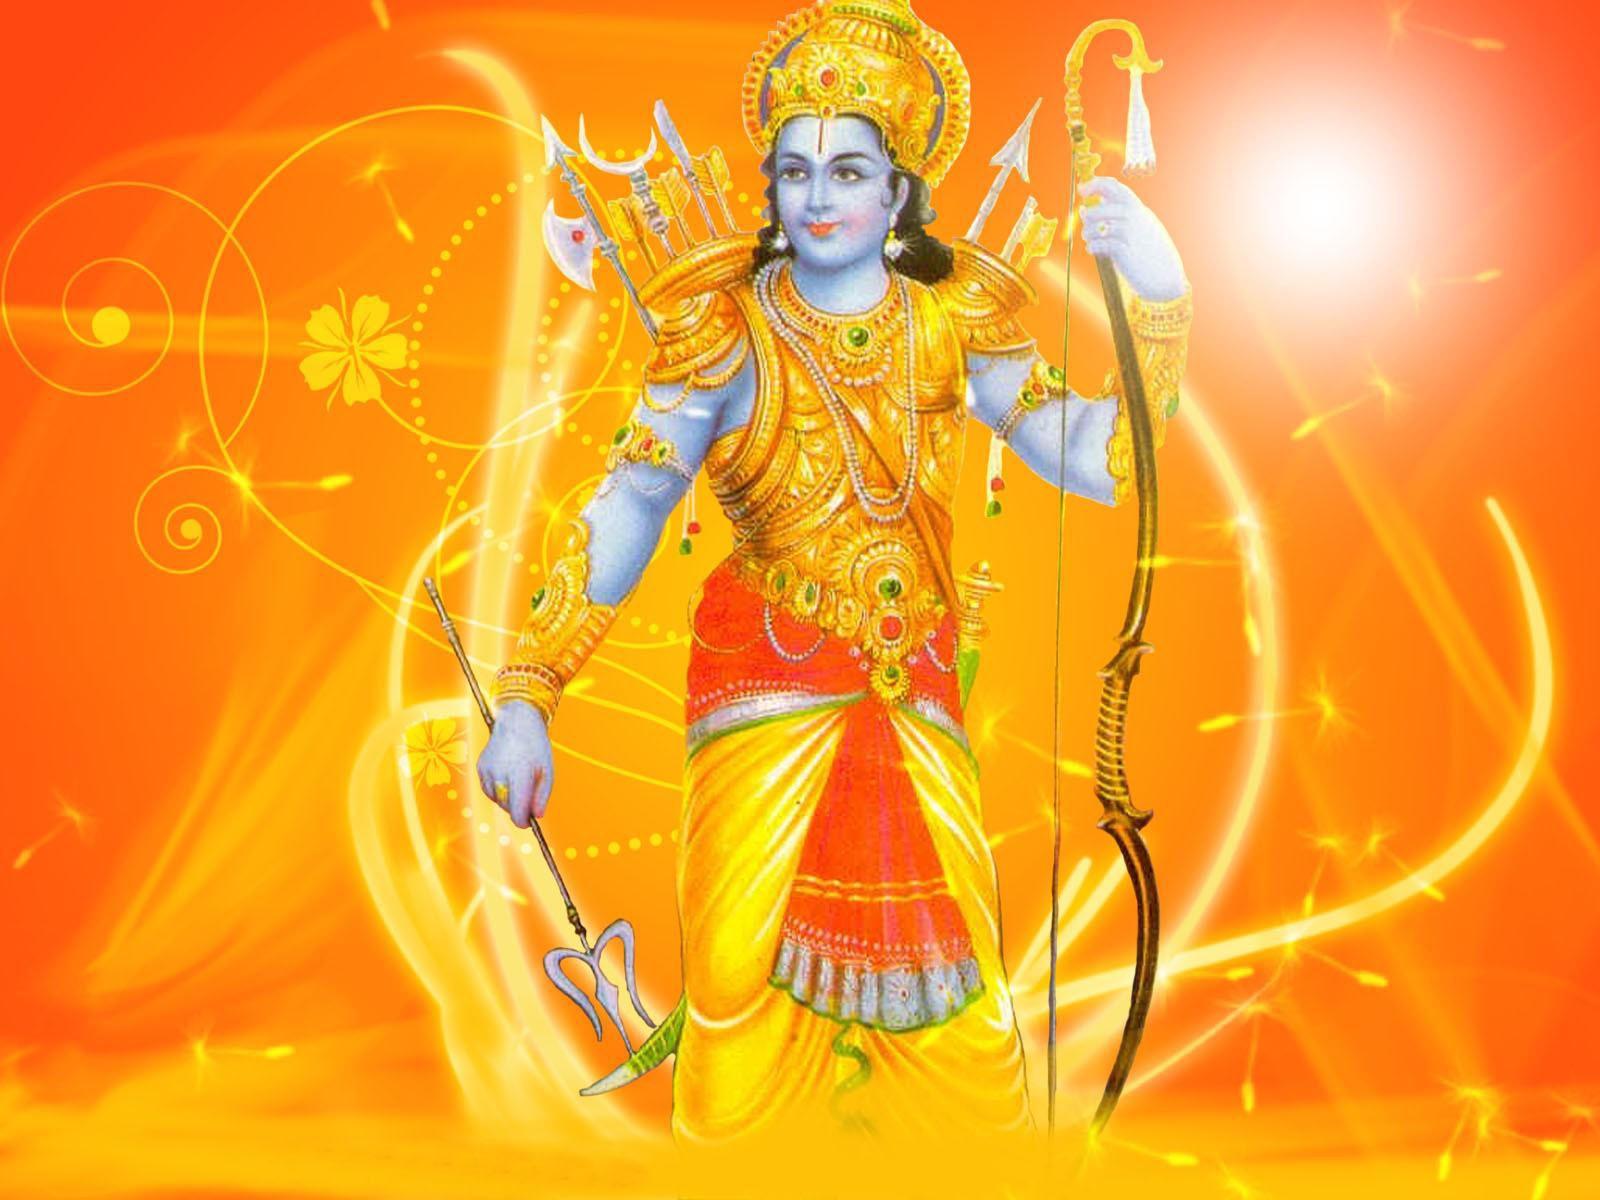 God Shri Ram New Hd Wallpapers Photos Free Downloads Top Free Hd